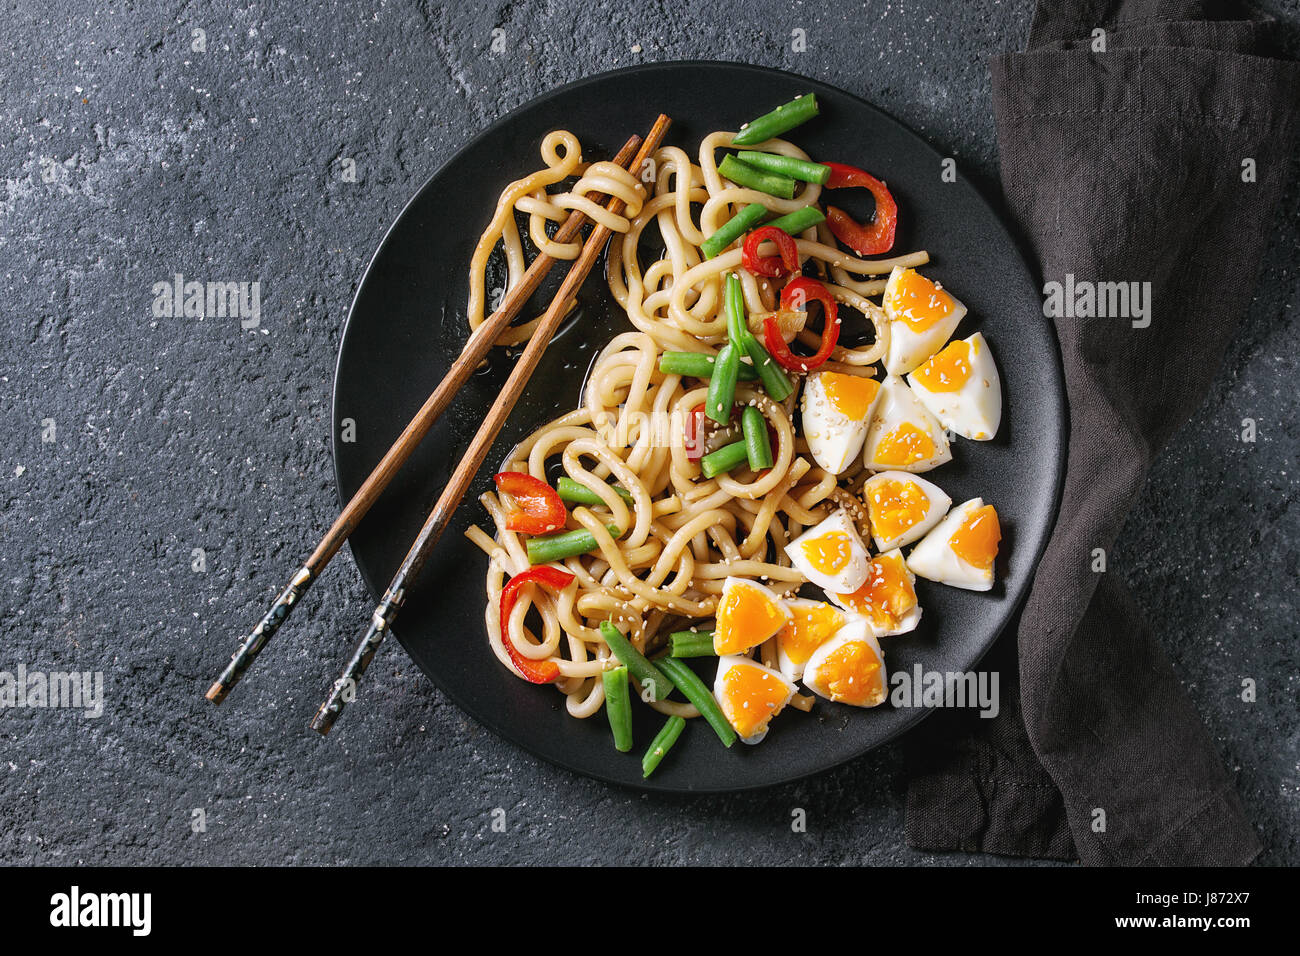 Stir fry udon noodles - Stock Image